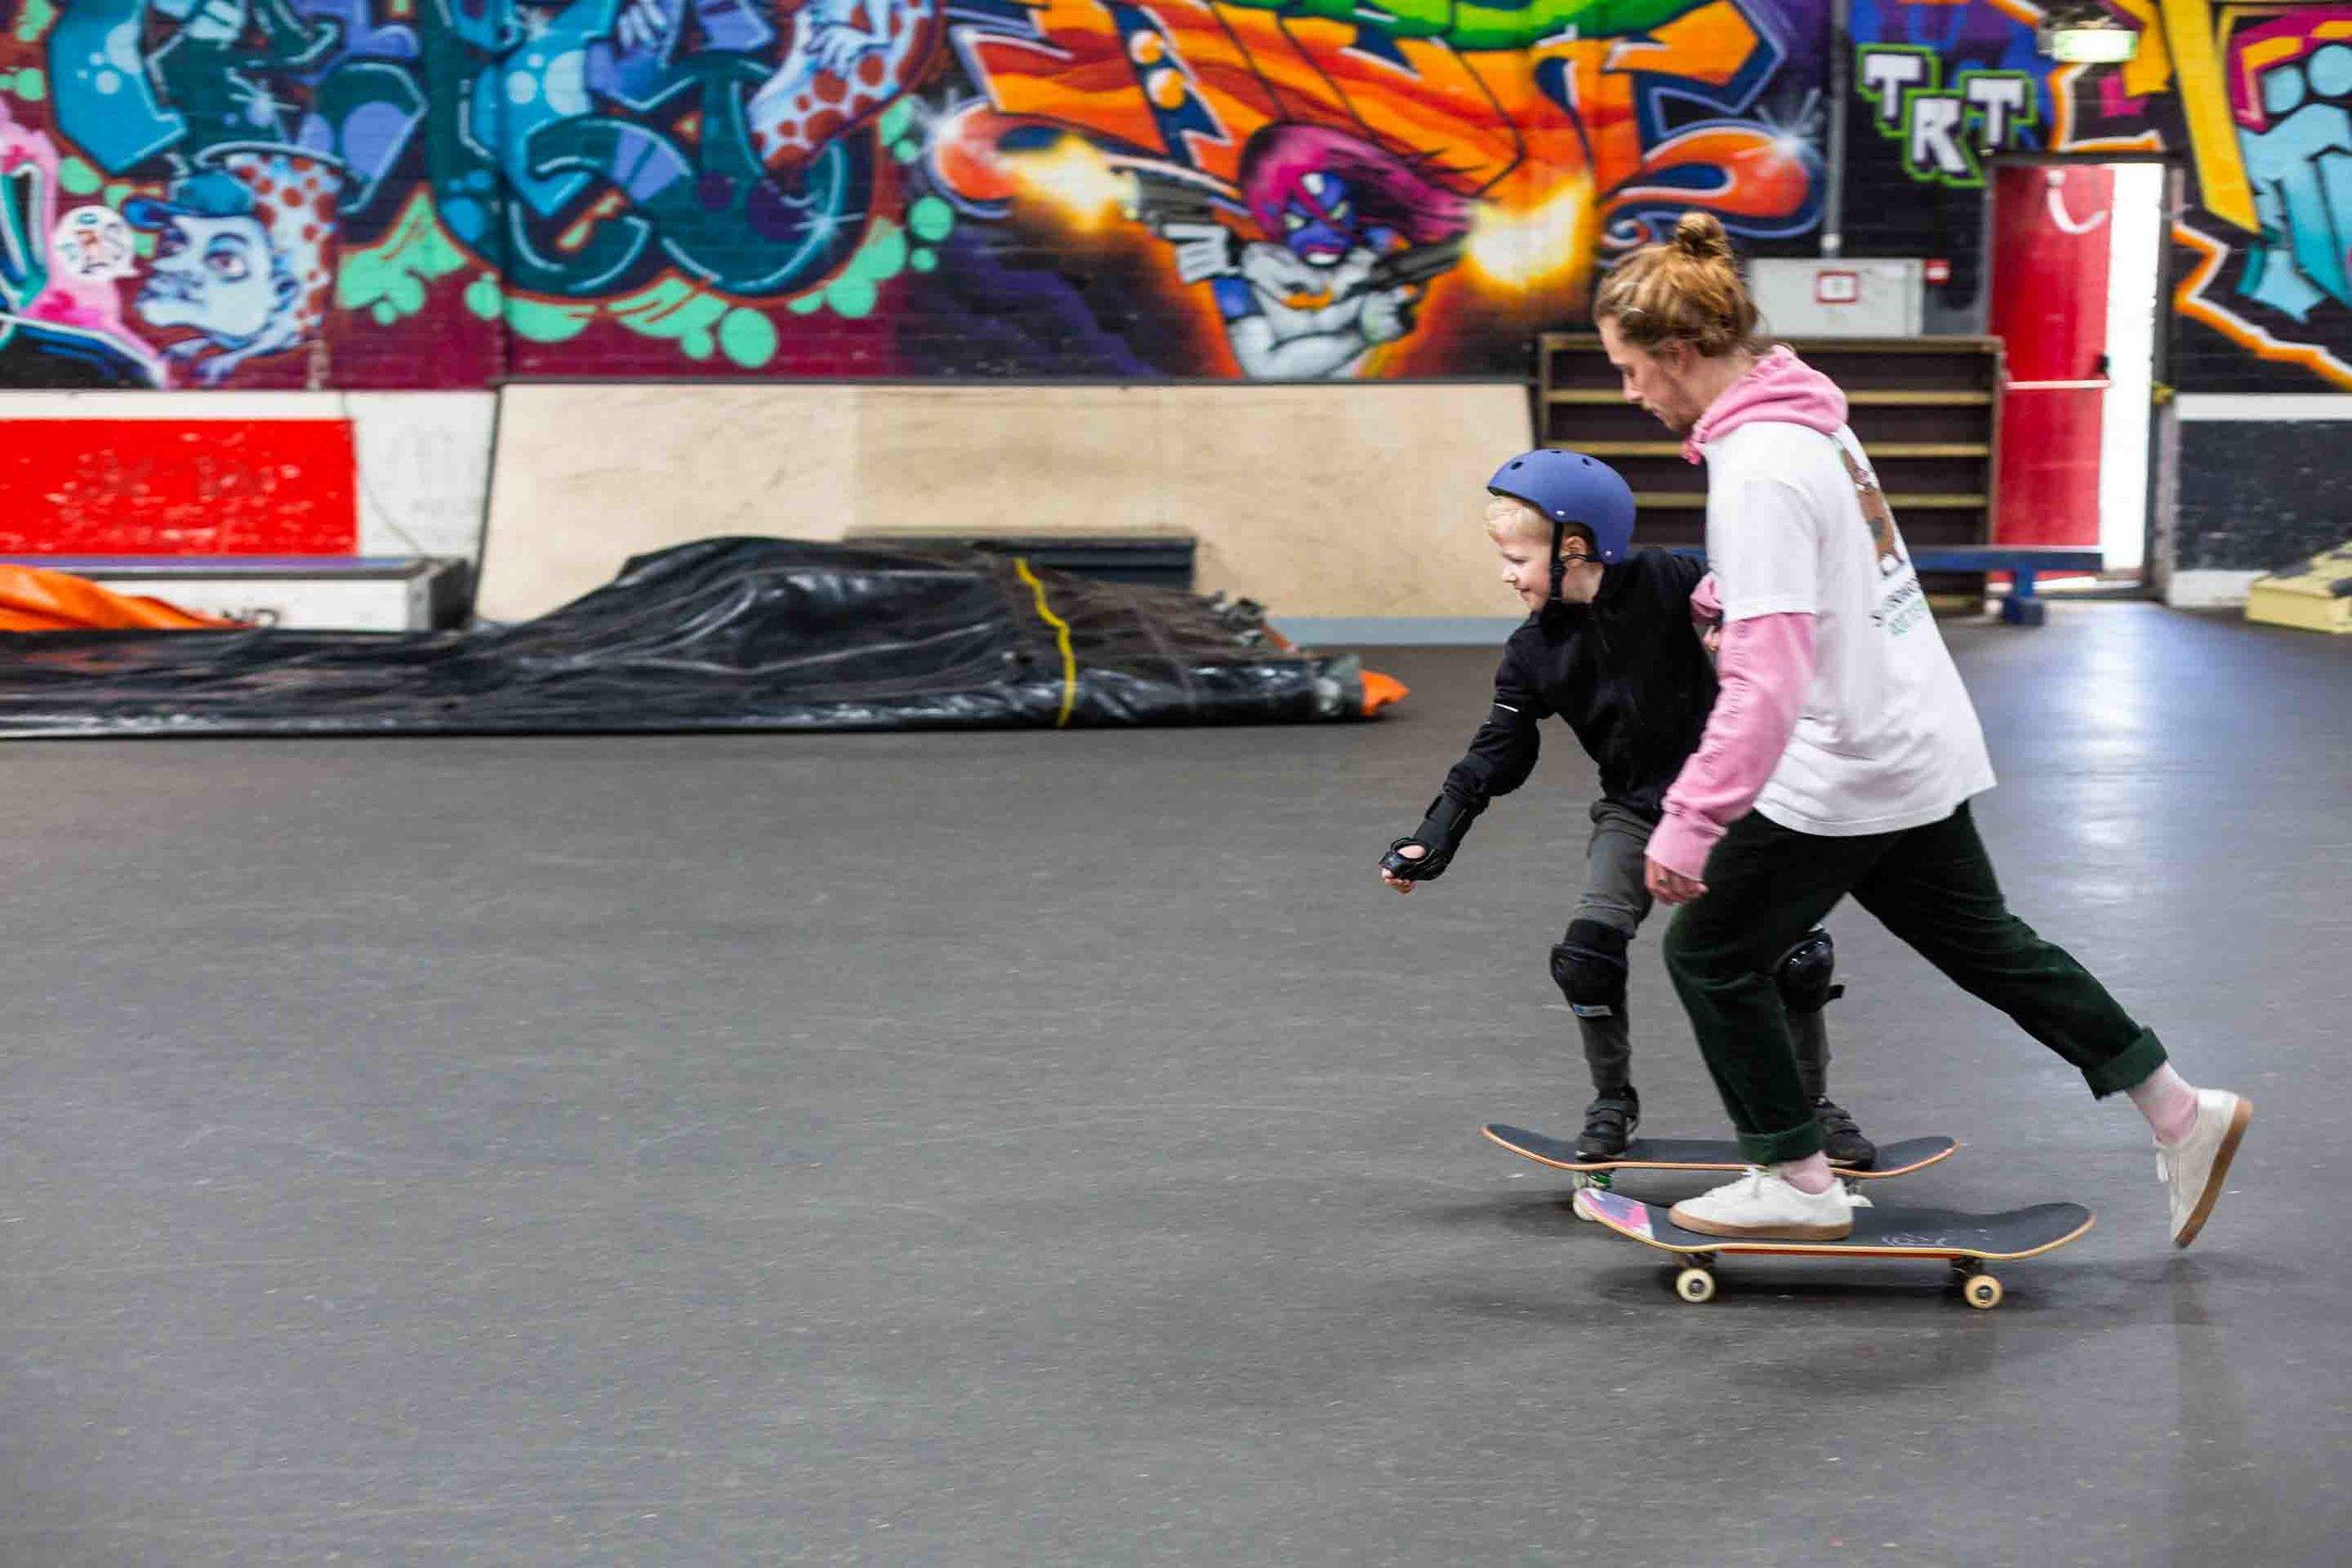 Skateboardschool_Rotterdam_skateboardles